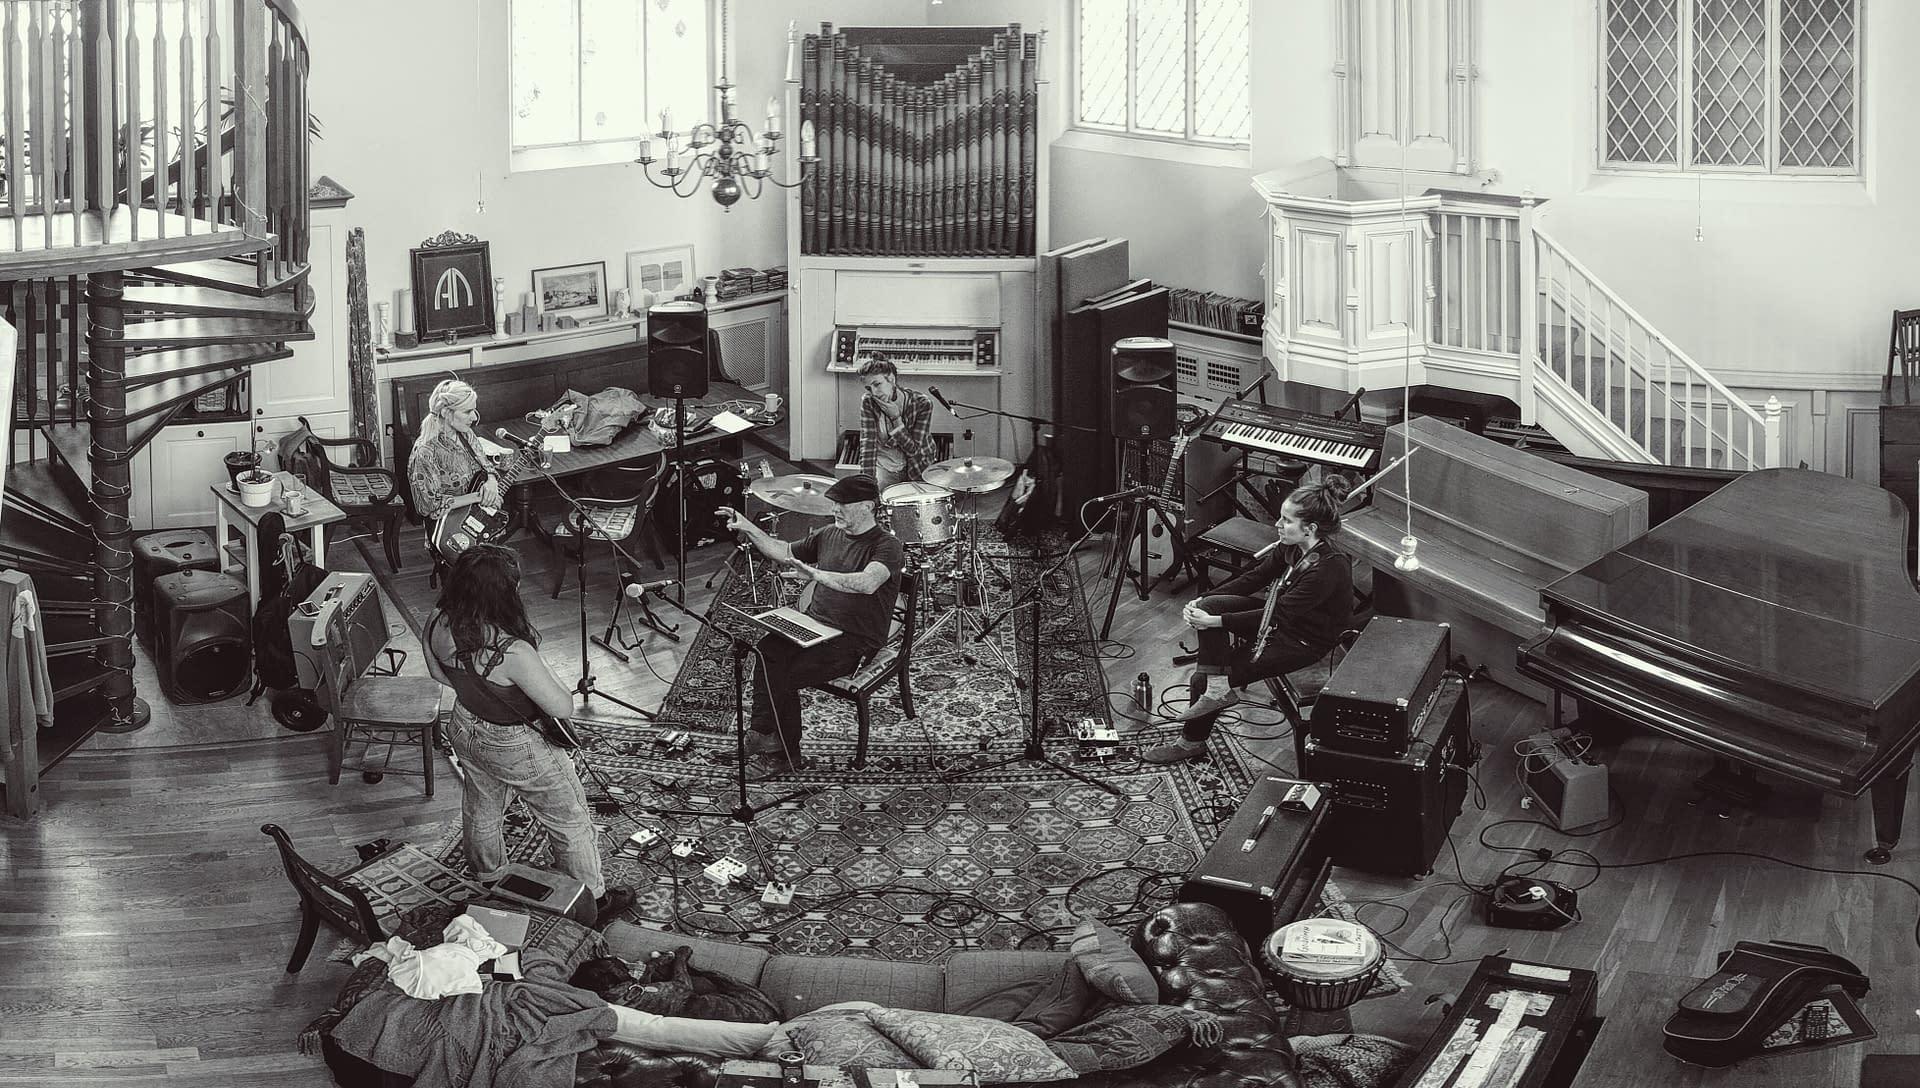 MARINE at Grand Chapel Studios with Rob Ellis